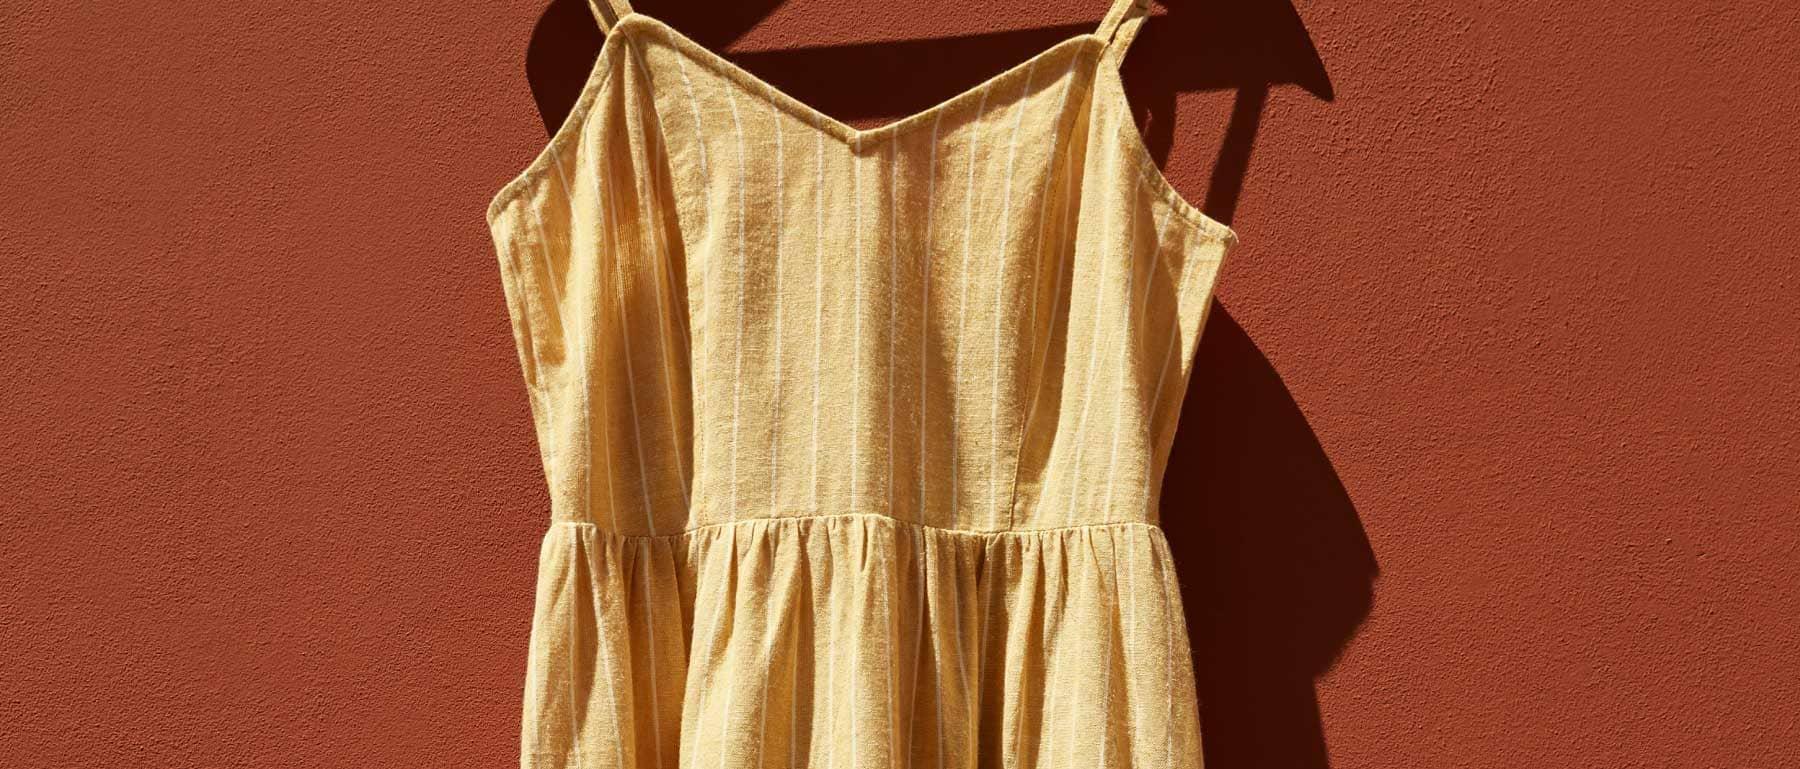 Beast Fabrics to Beat the Heat